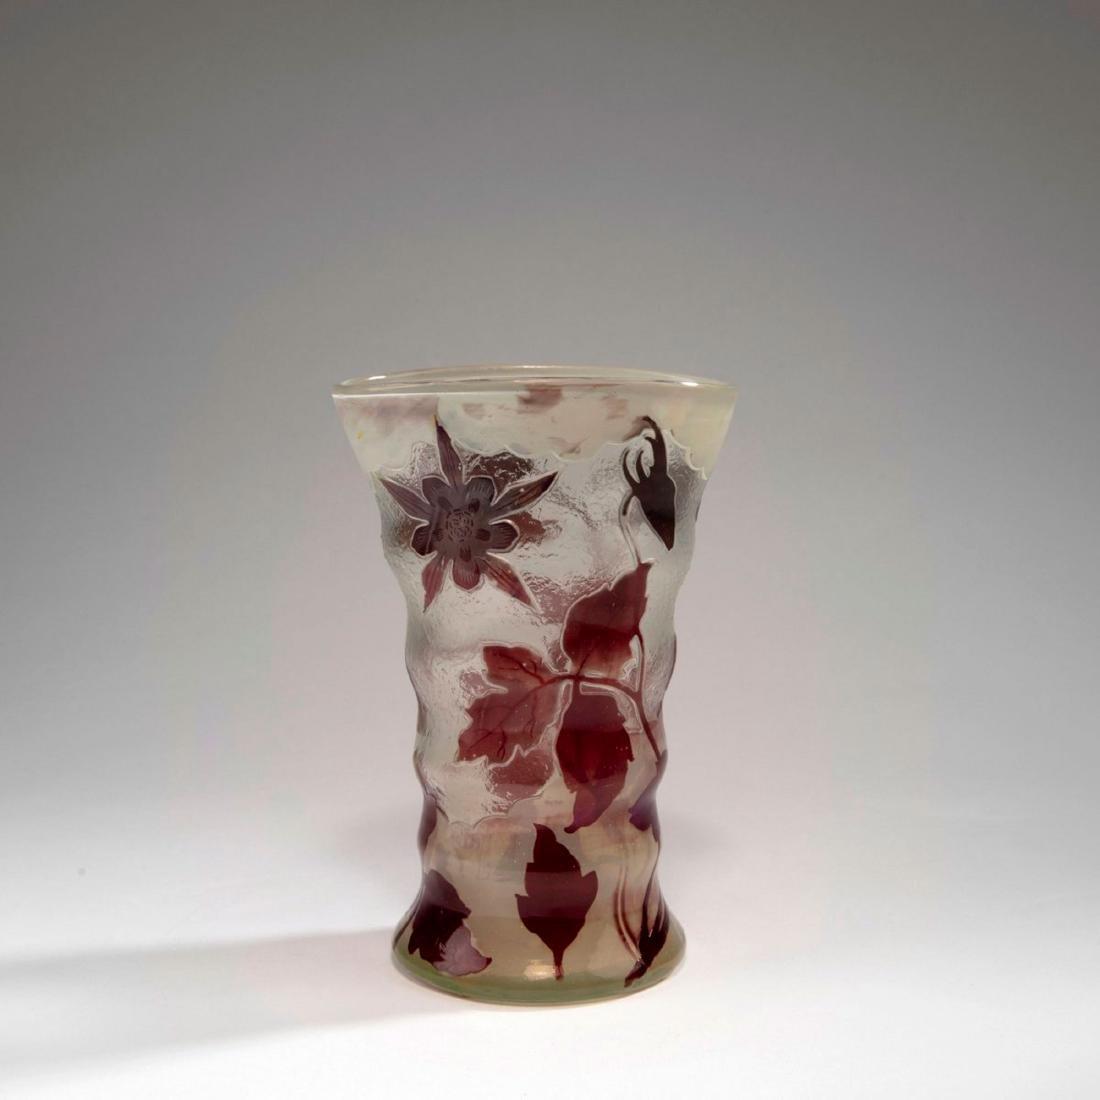 'Ancolies' vase, 1900-02